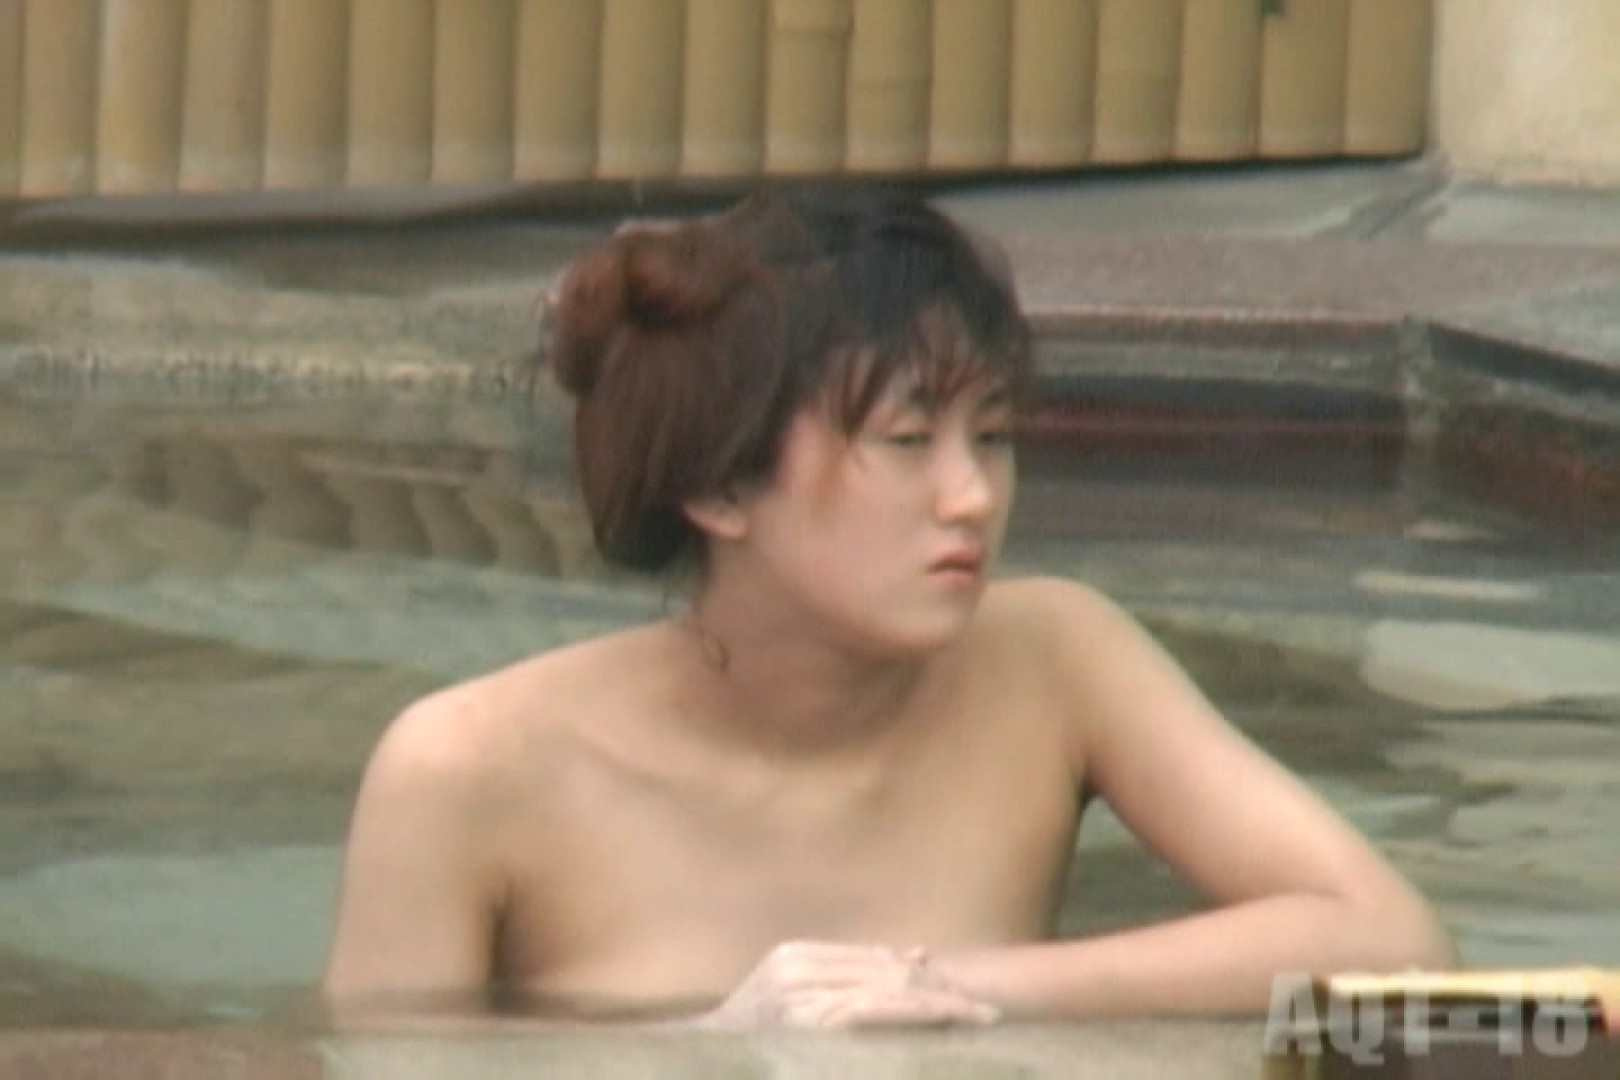 Aquaな露天風呂Vol.862 盗撮 AV無料動画キャプチャ 92PICs 83